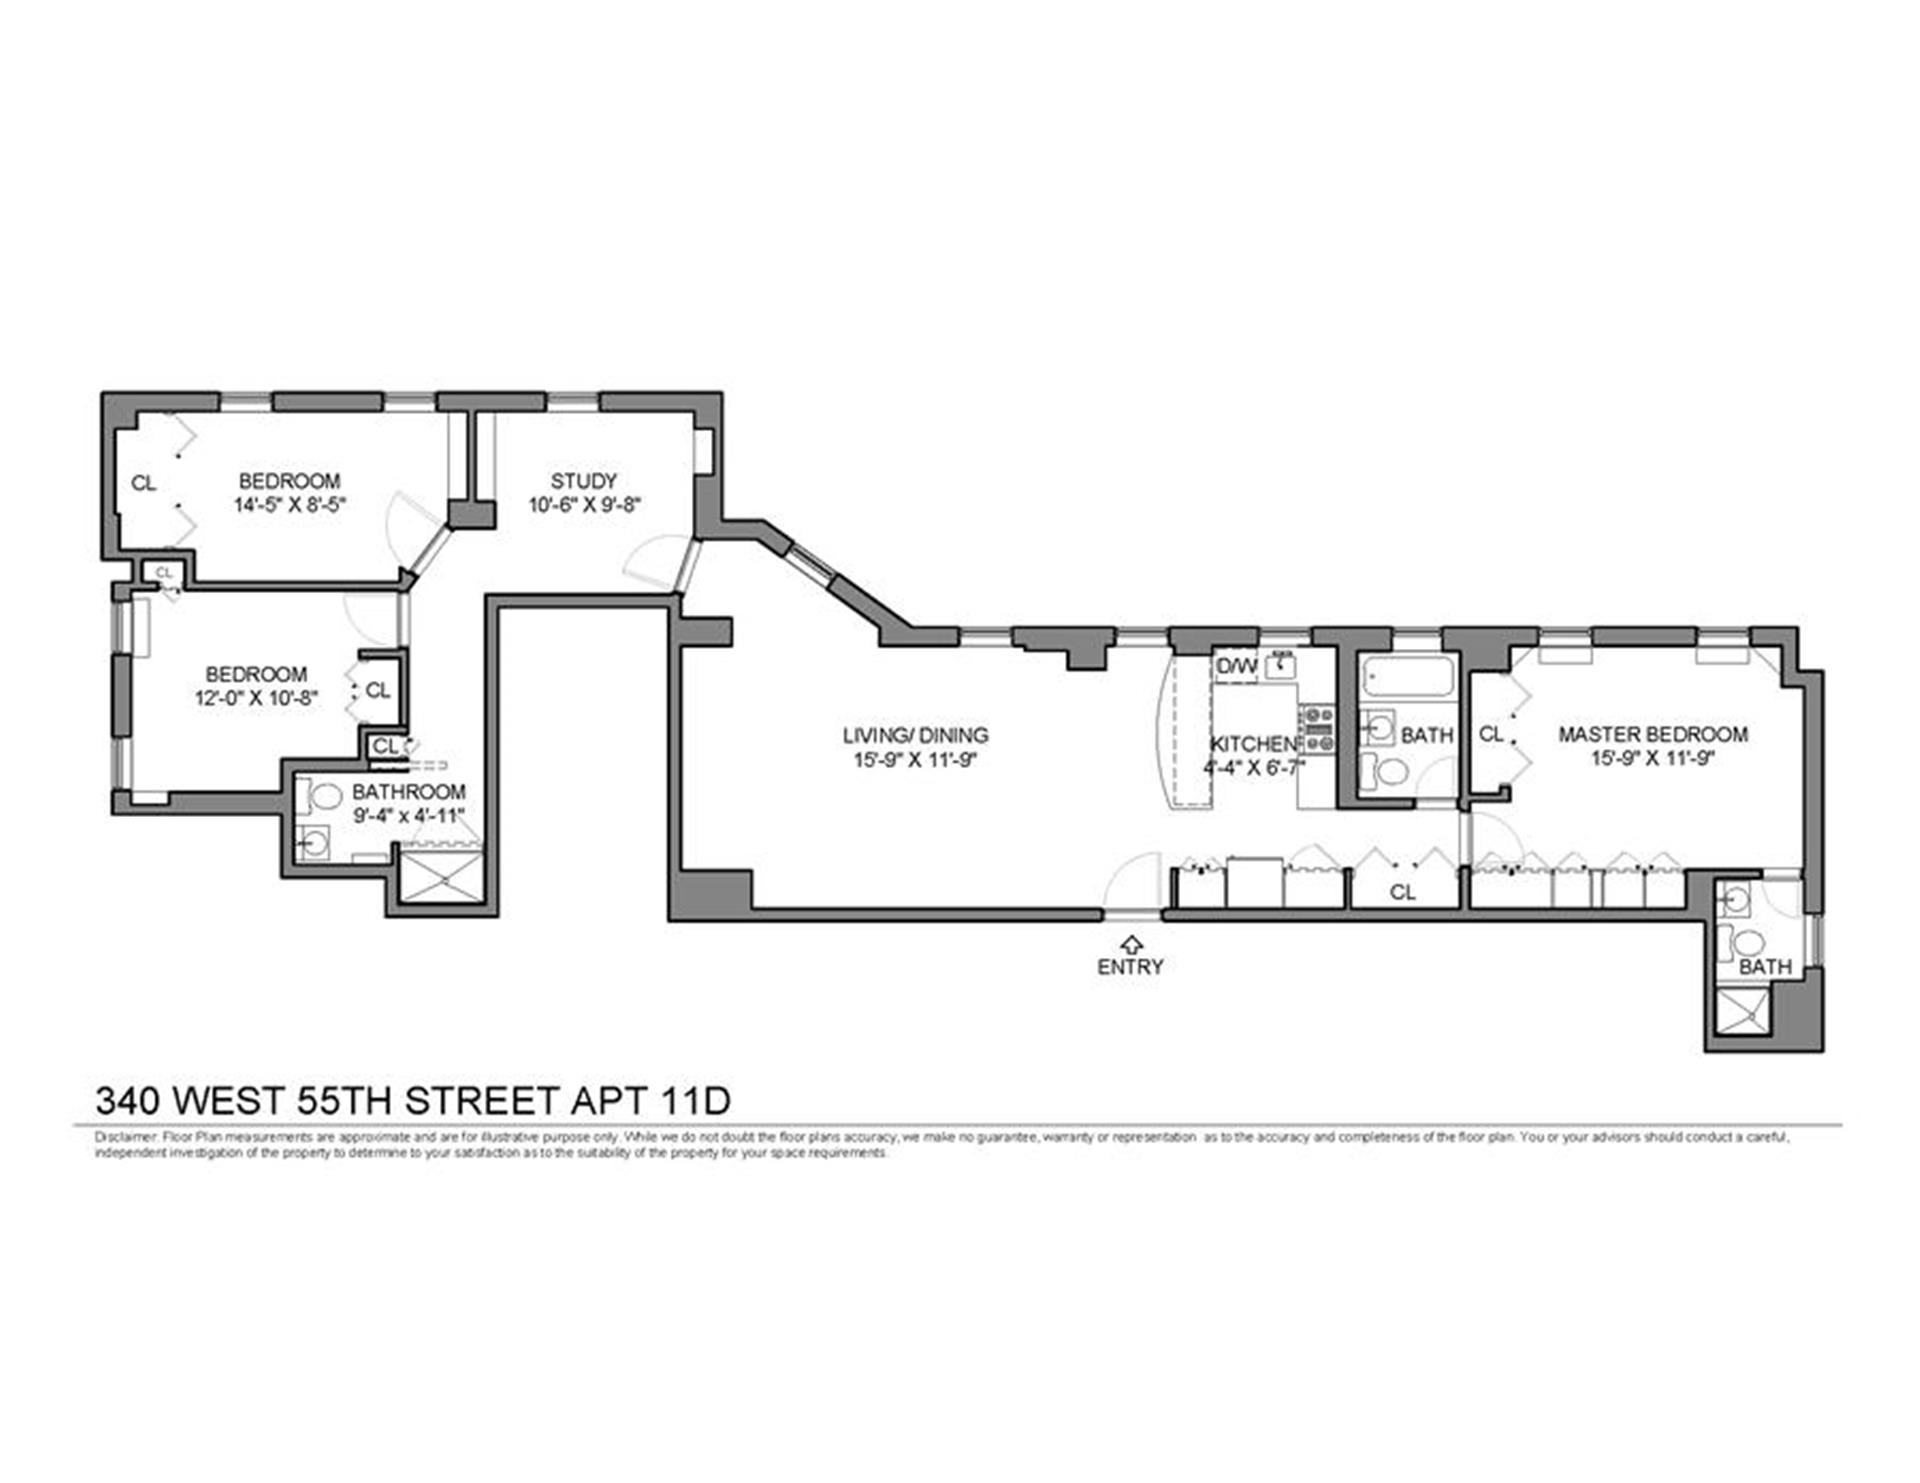 Floor plan of 340 West 55th St, 11DC - Clinton, New York